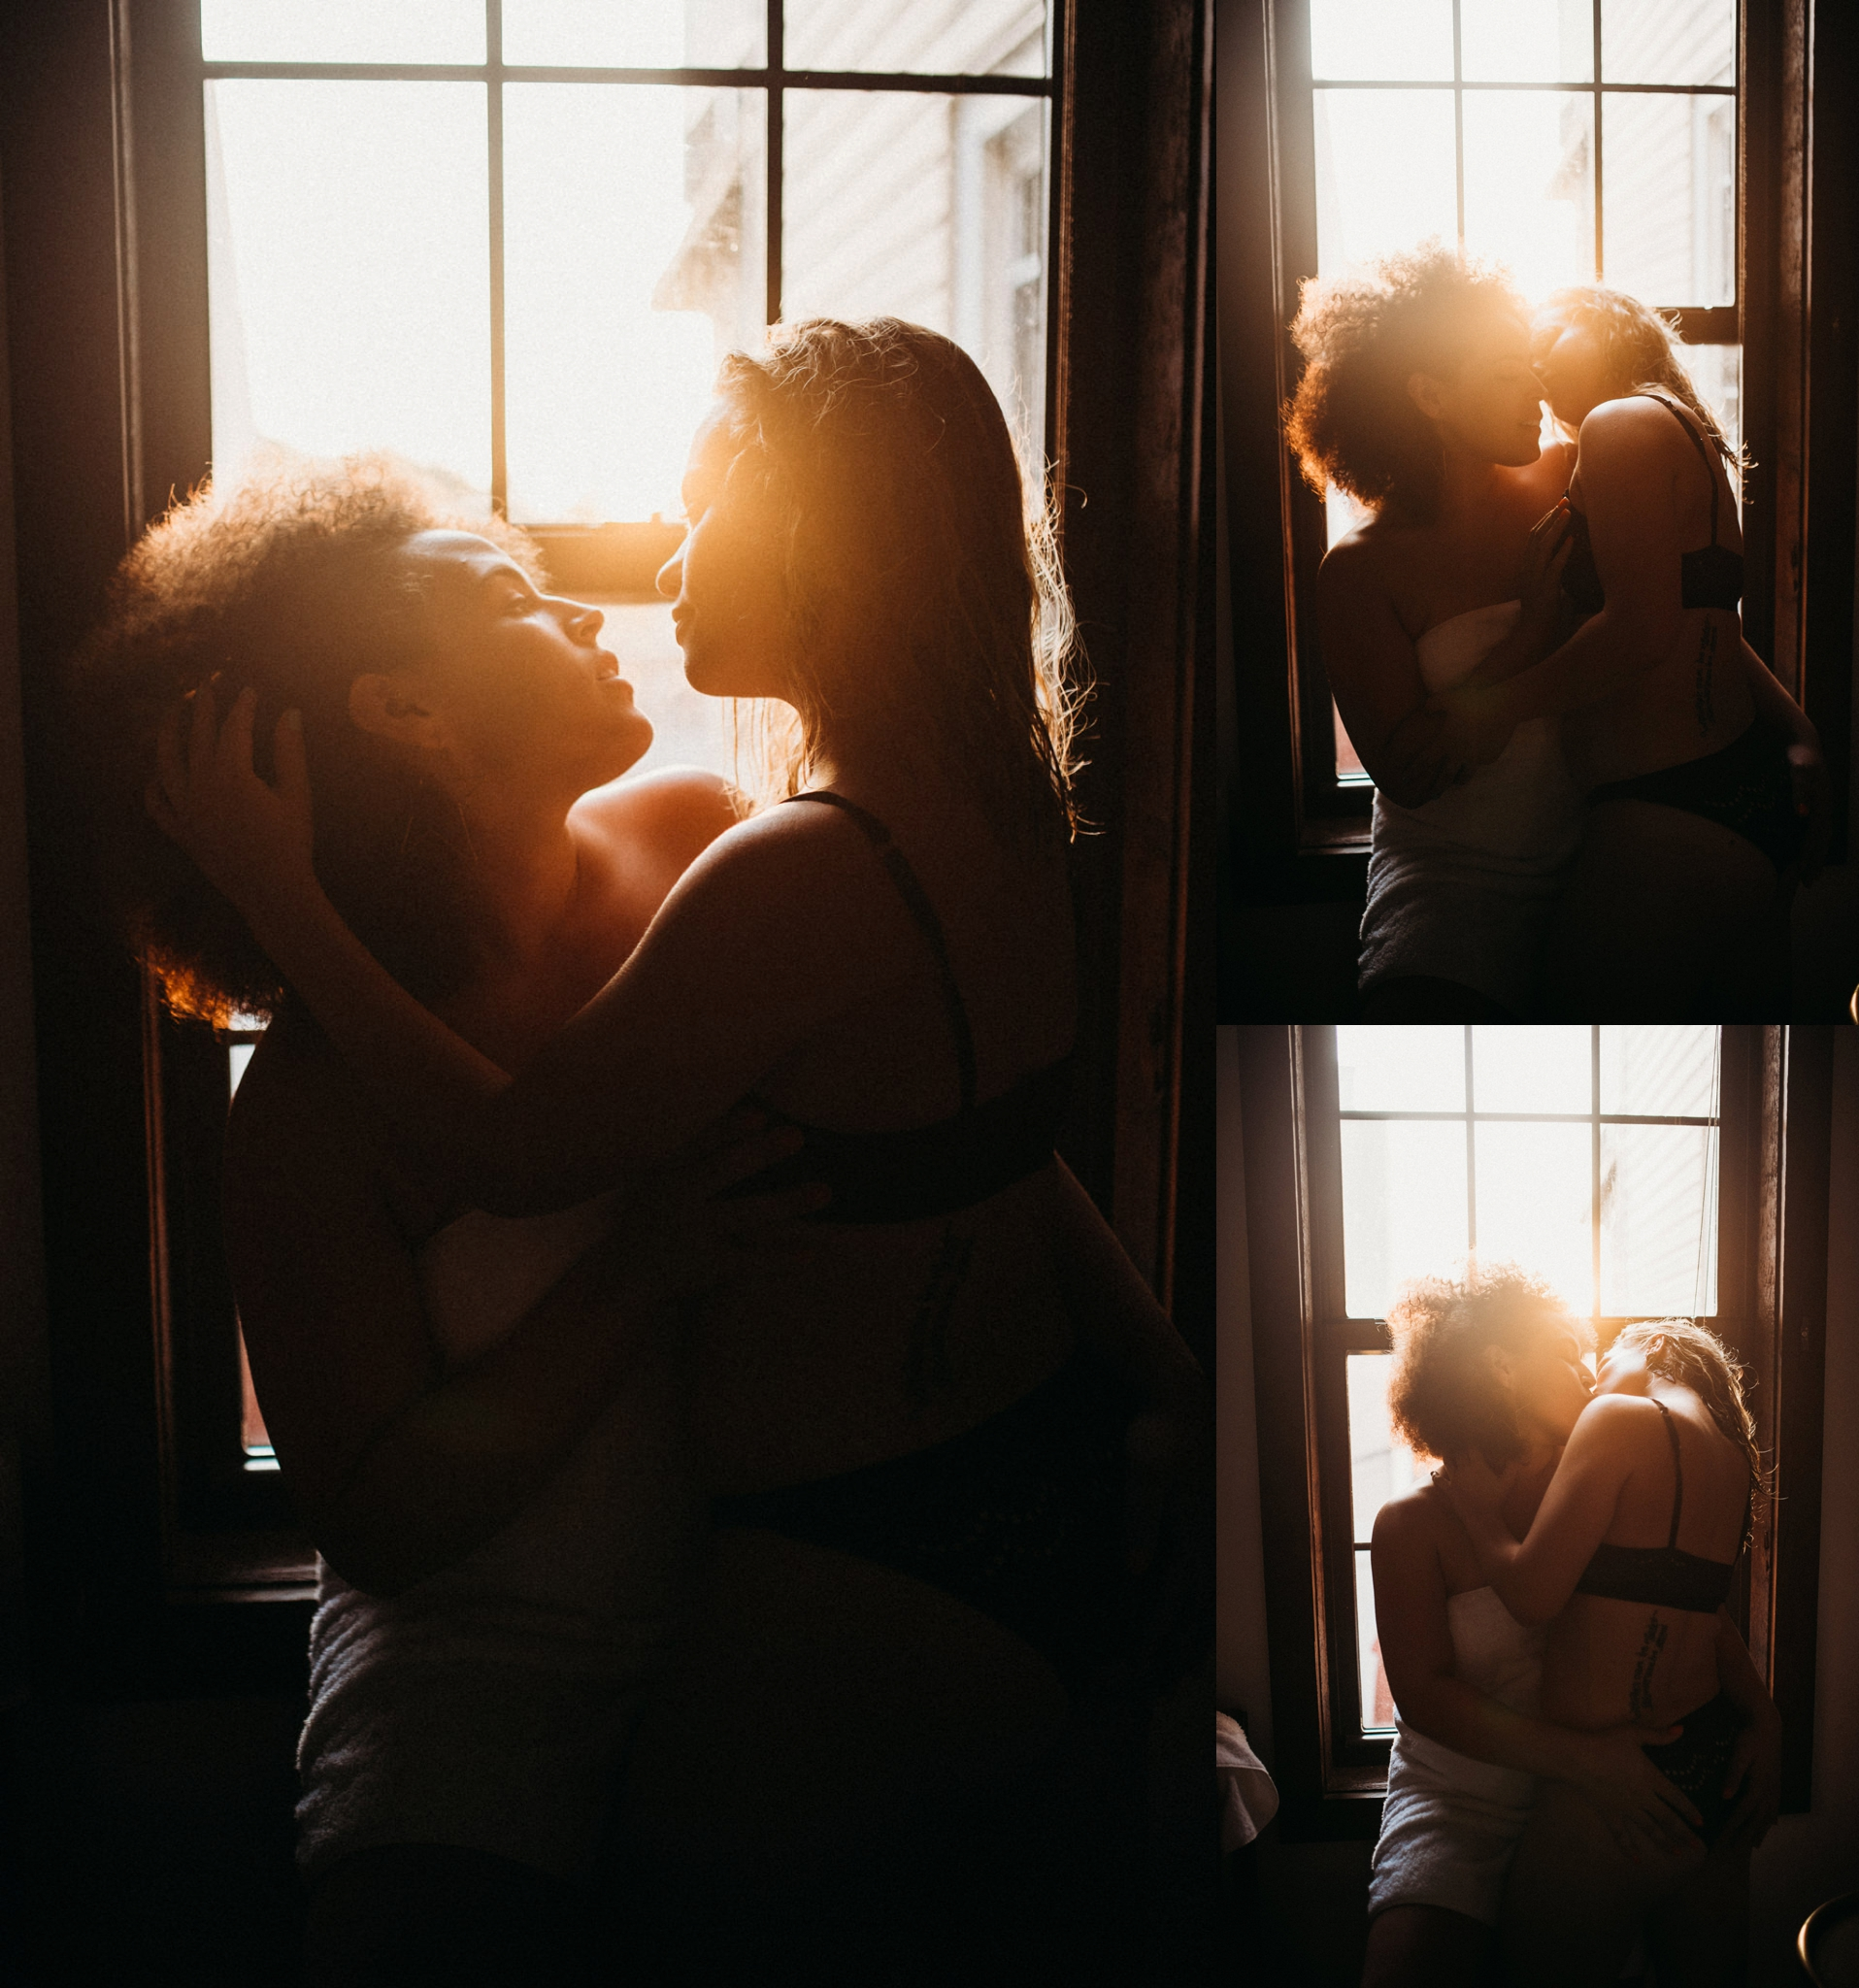 twyla jones photography - treasure coast florida - intimate couples session urban cowboy b&b | brooklyn New York_0047.jpg